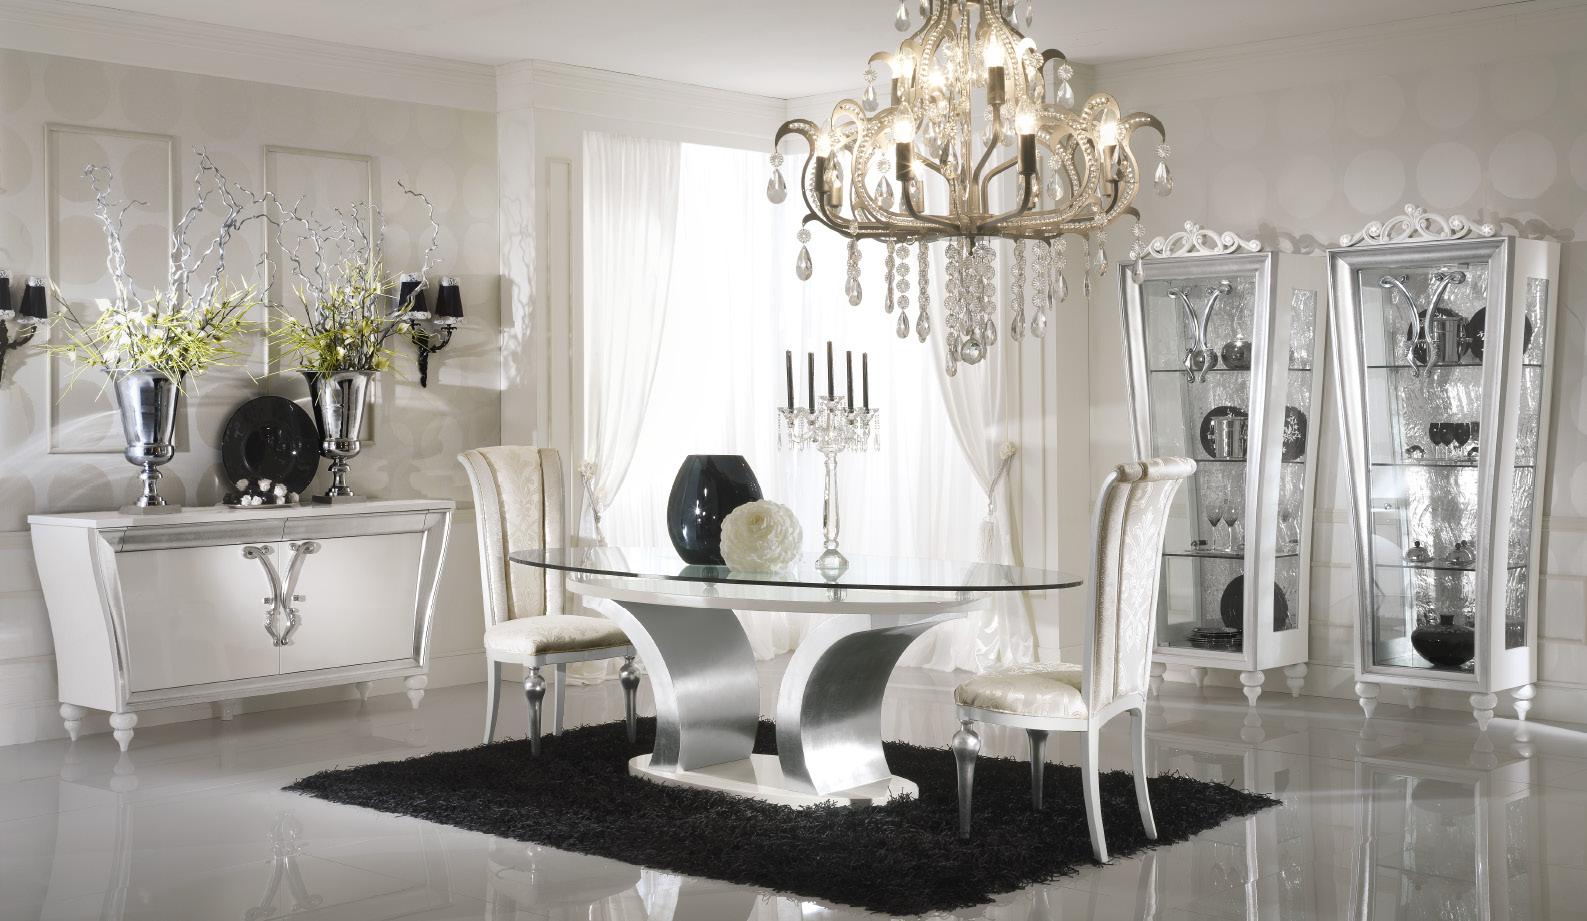 7Bello Arredi & Design | Signorini